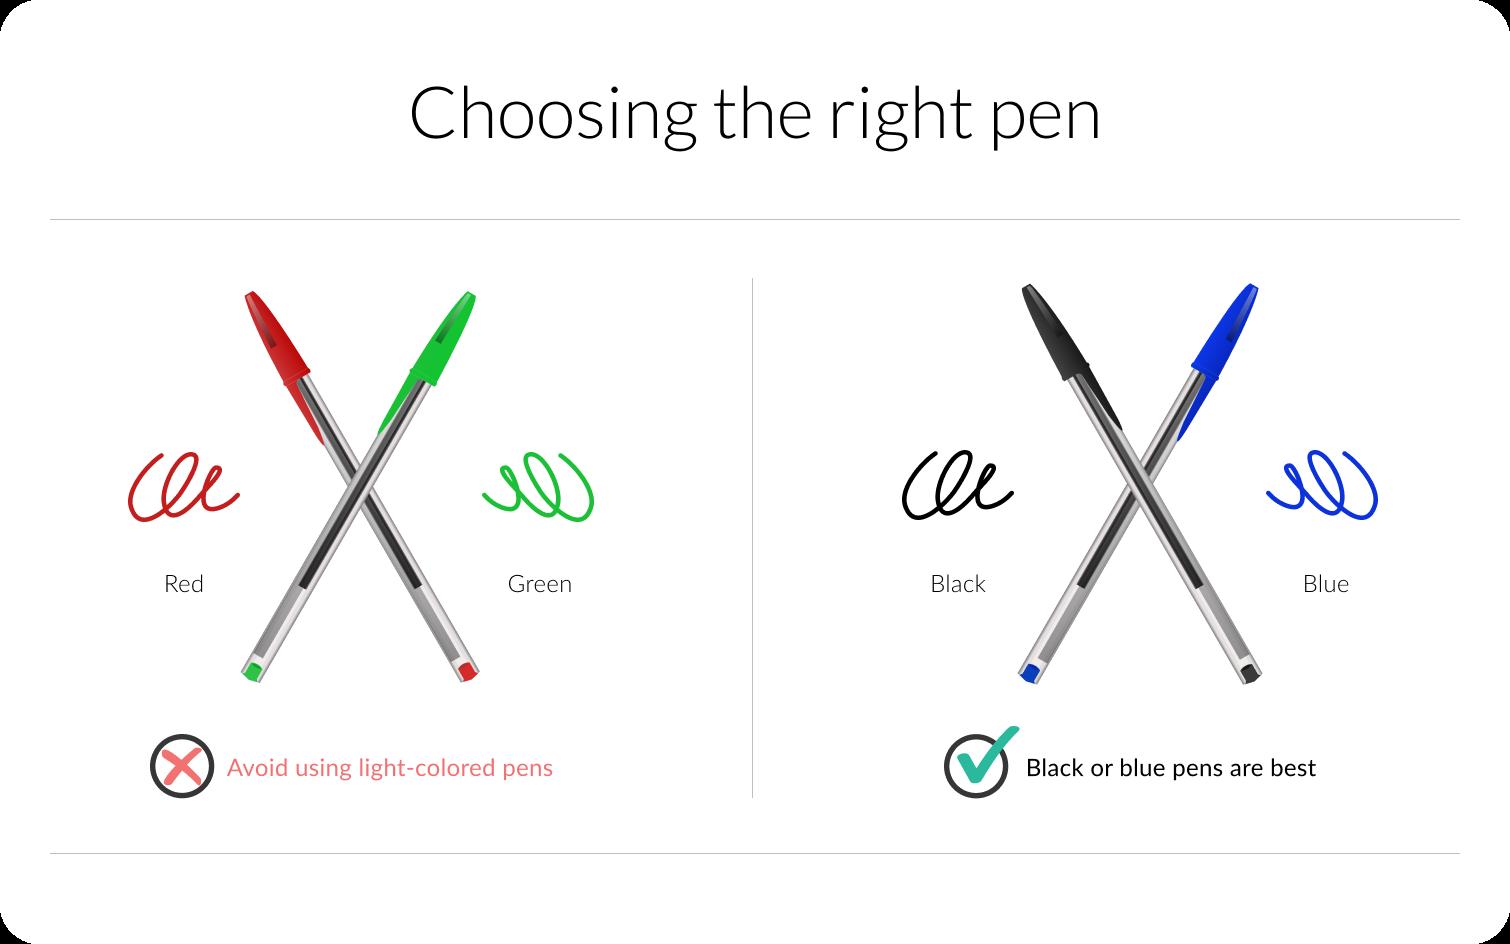 Choosing the right pen